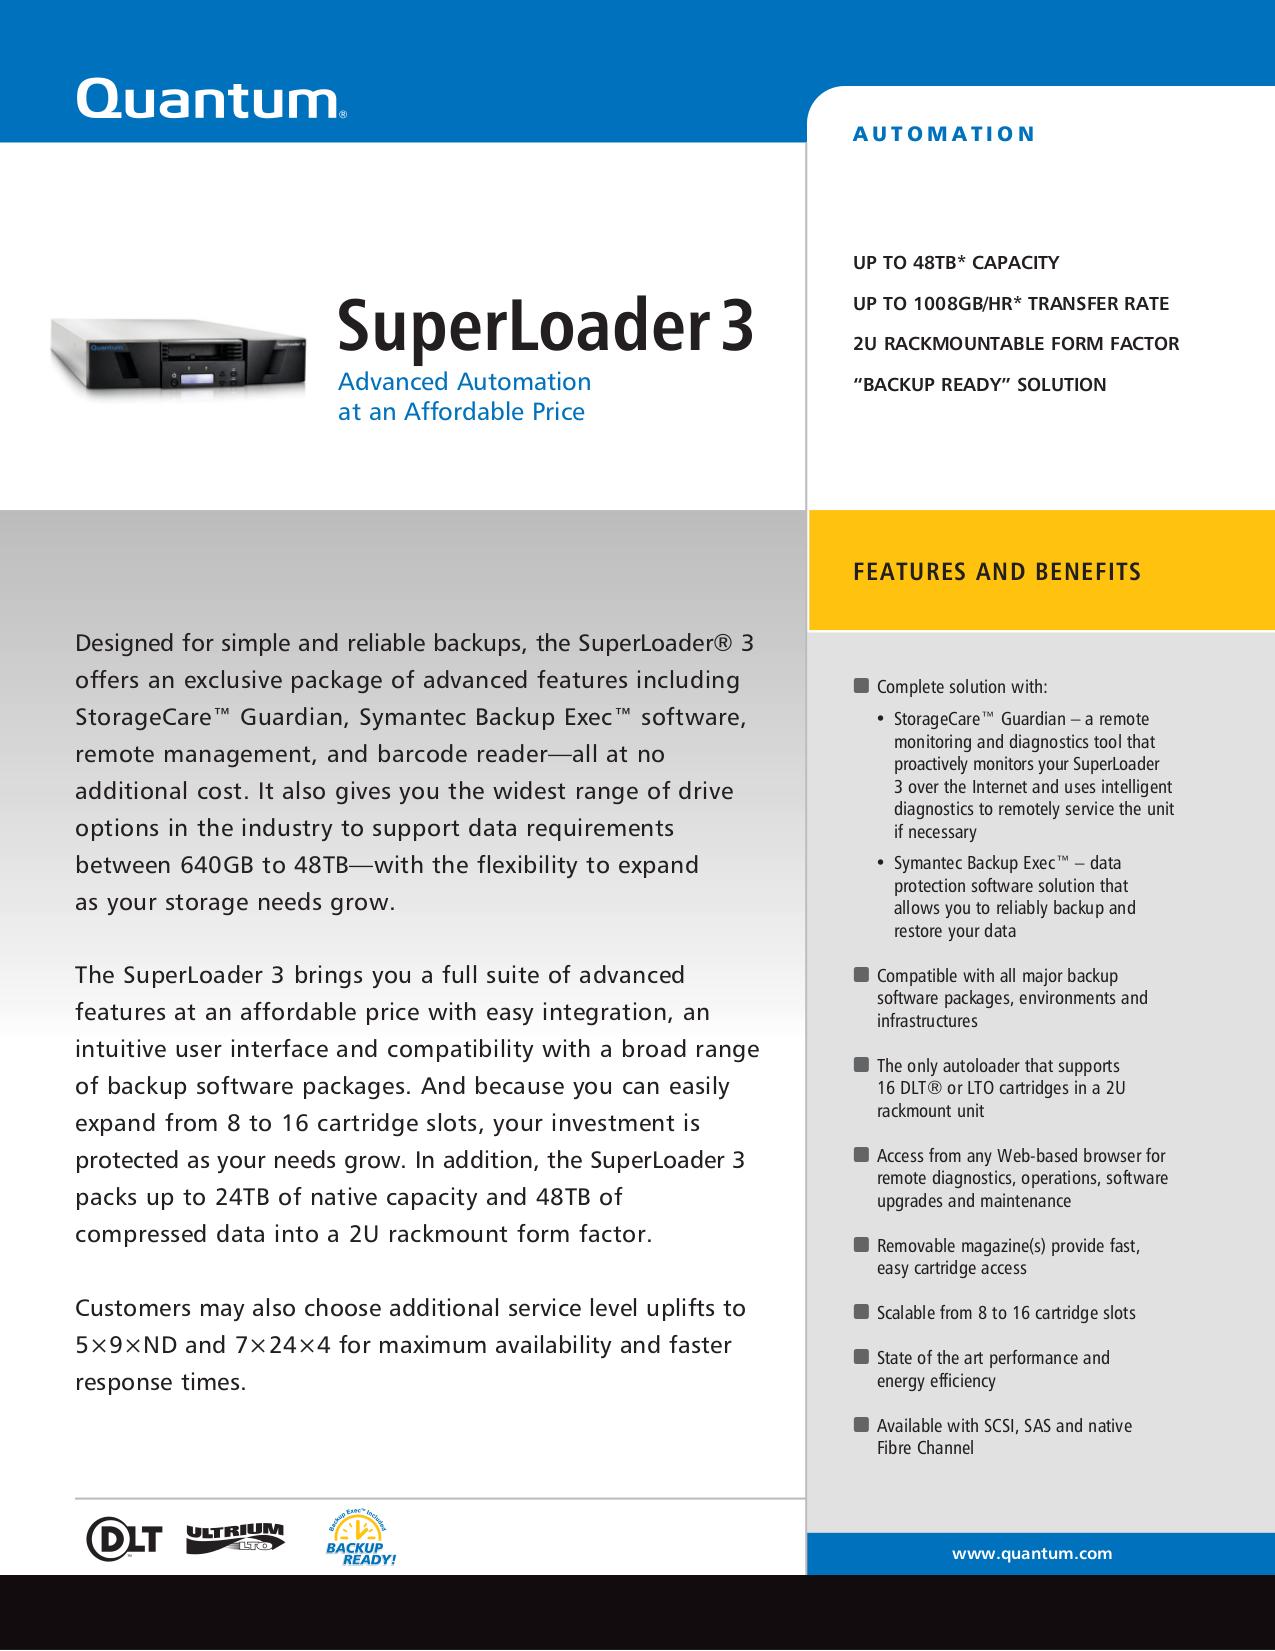 pdf for Quantum Storage SuperLoader DLT manual